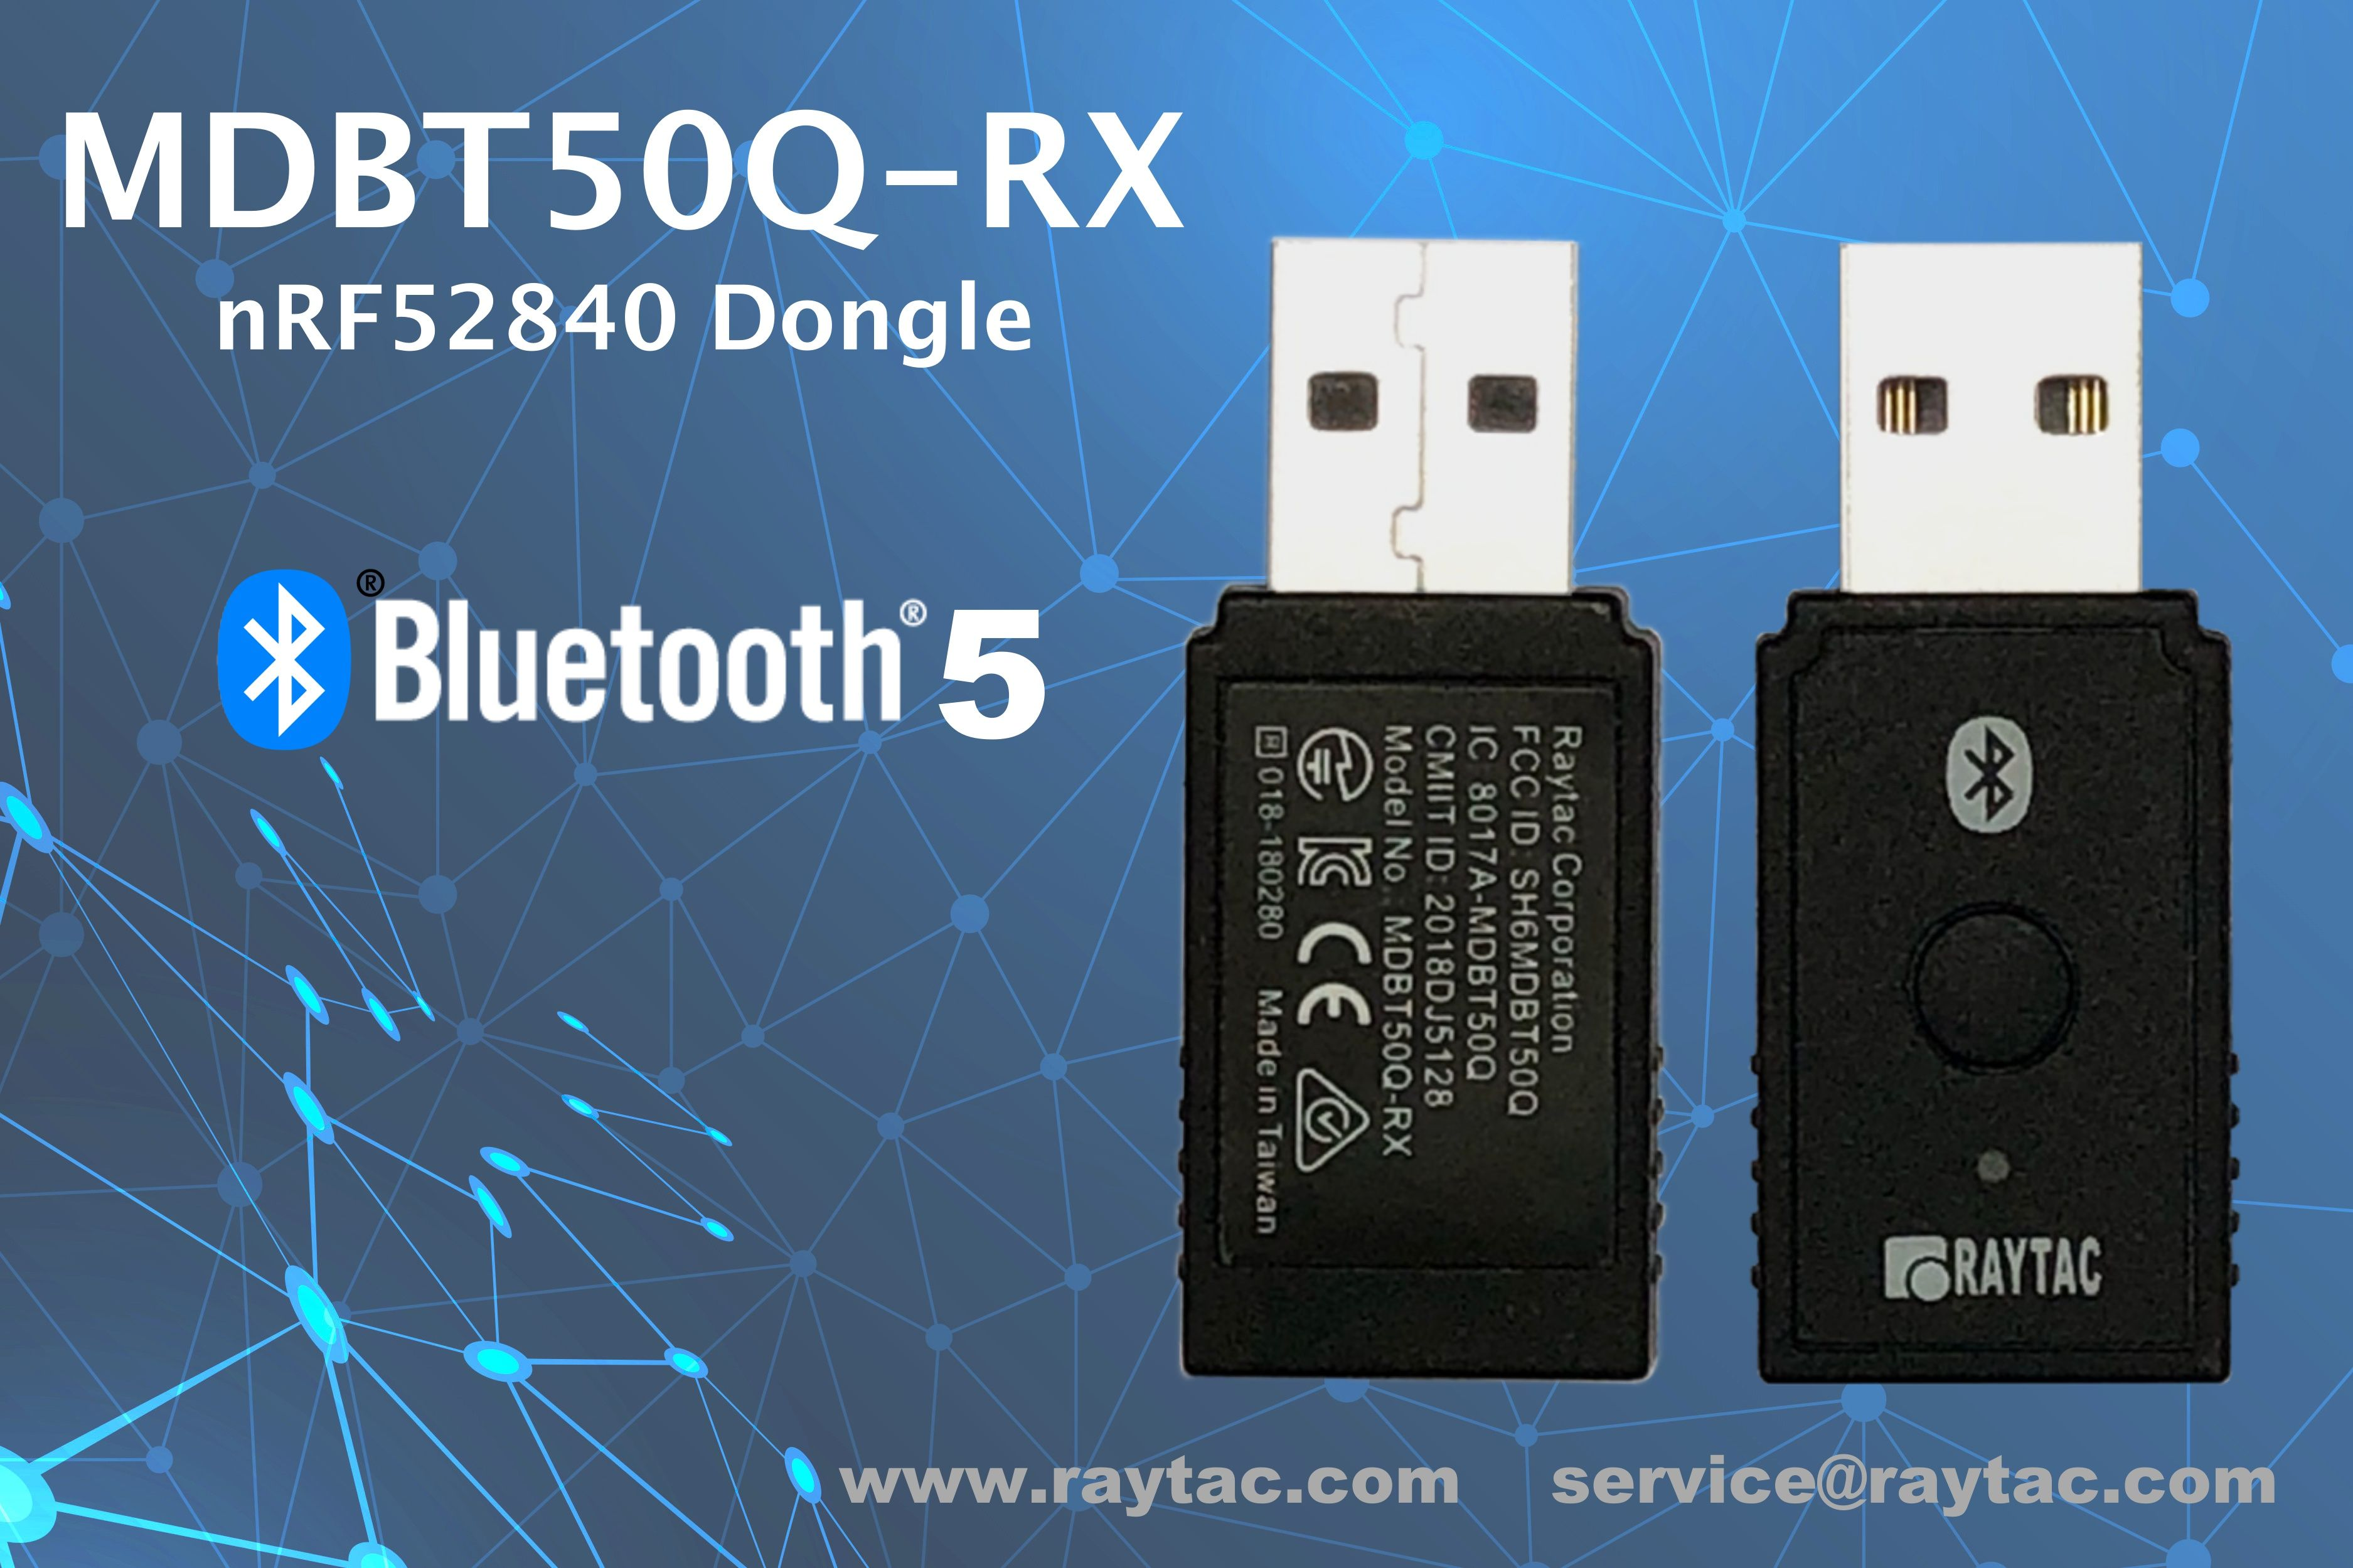 Raytac Bluetooth USB Dongle: MDBT50Q-RX Nordic nRF52840 Solution